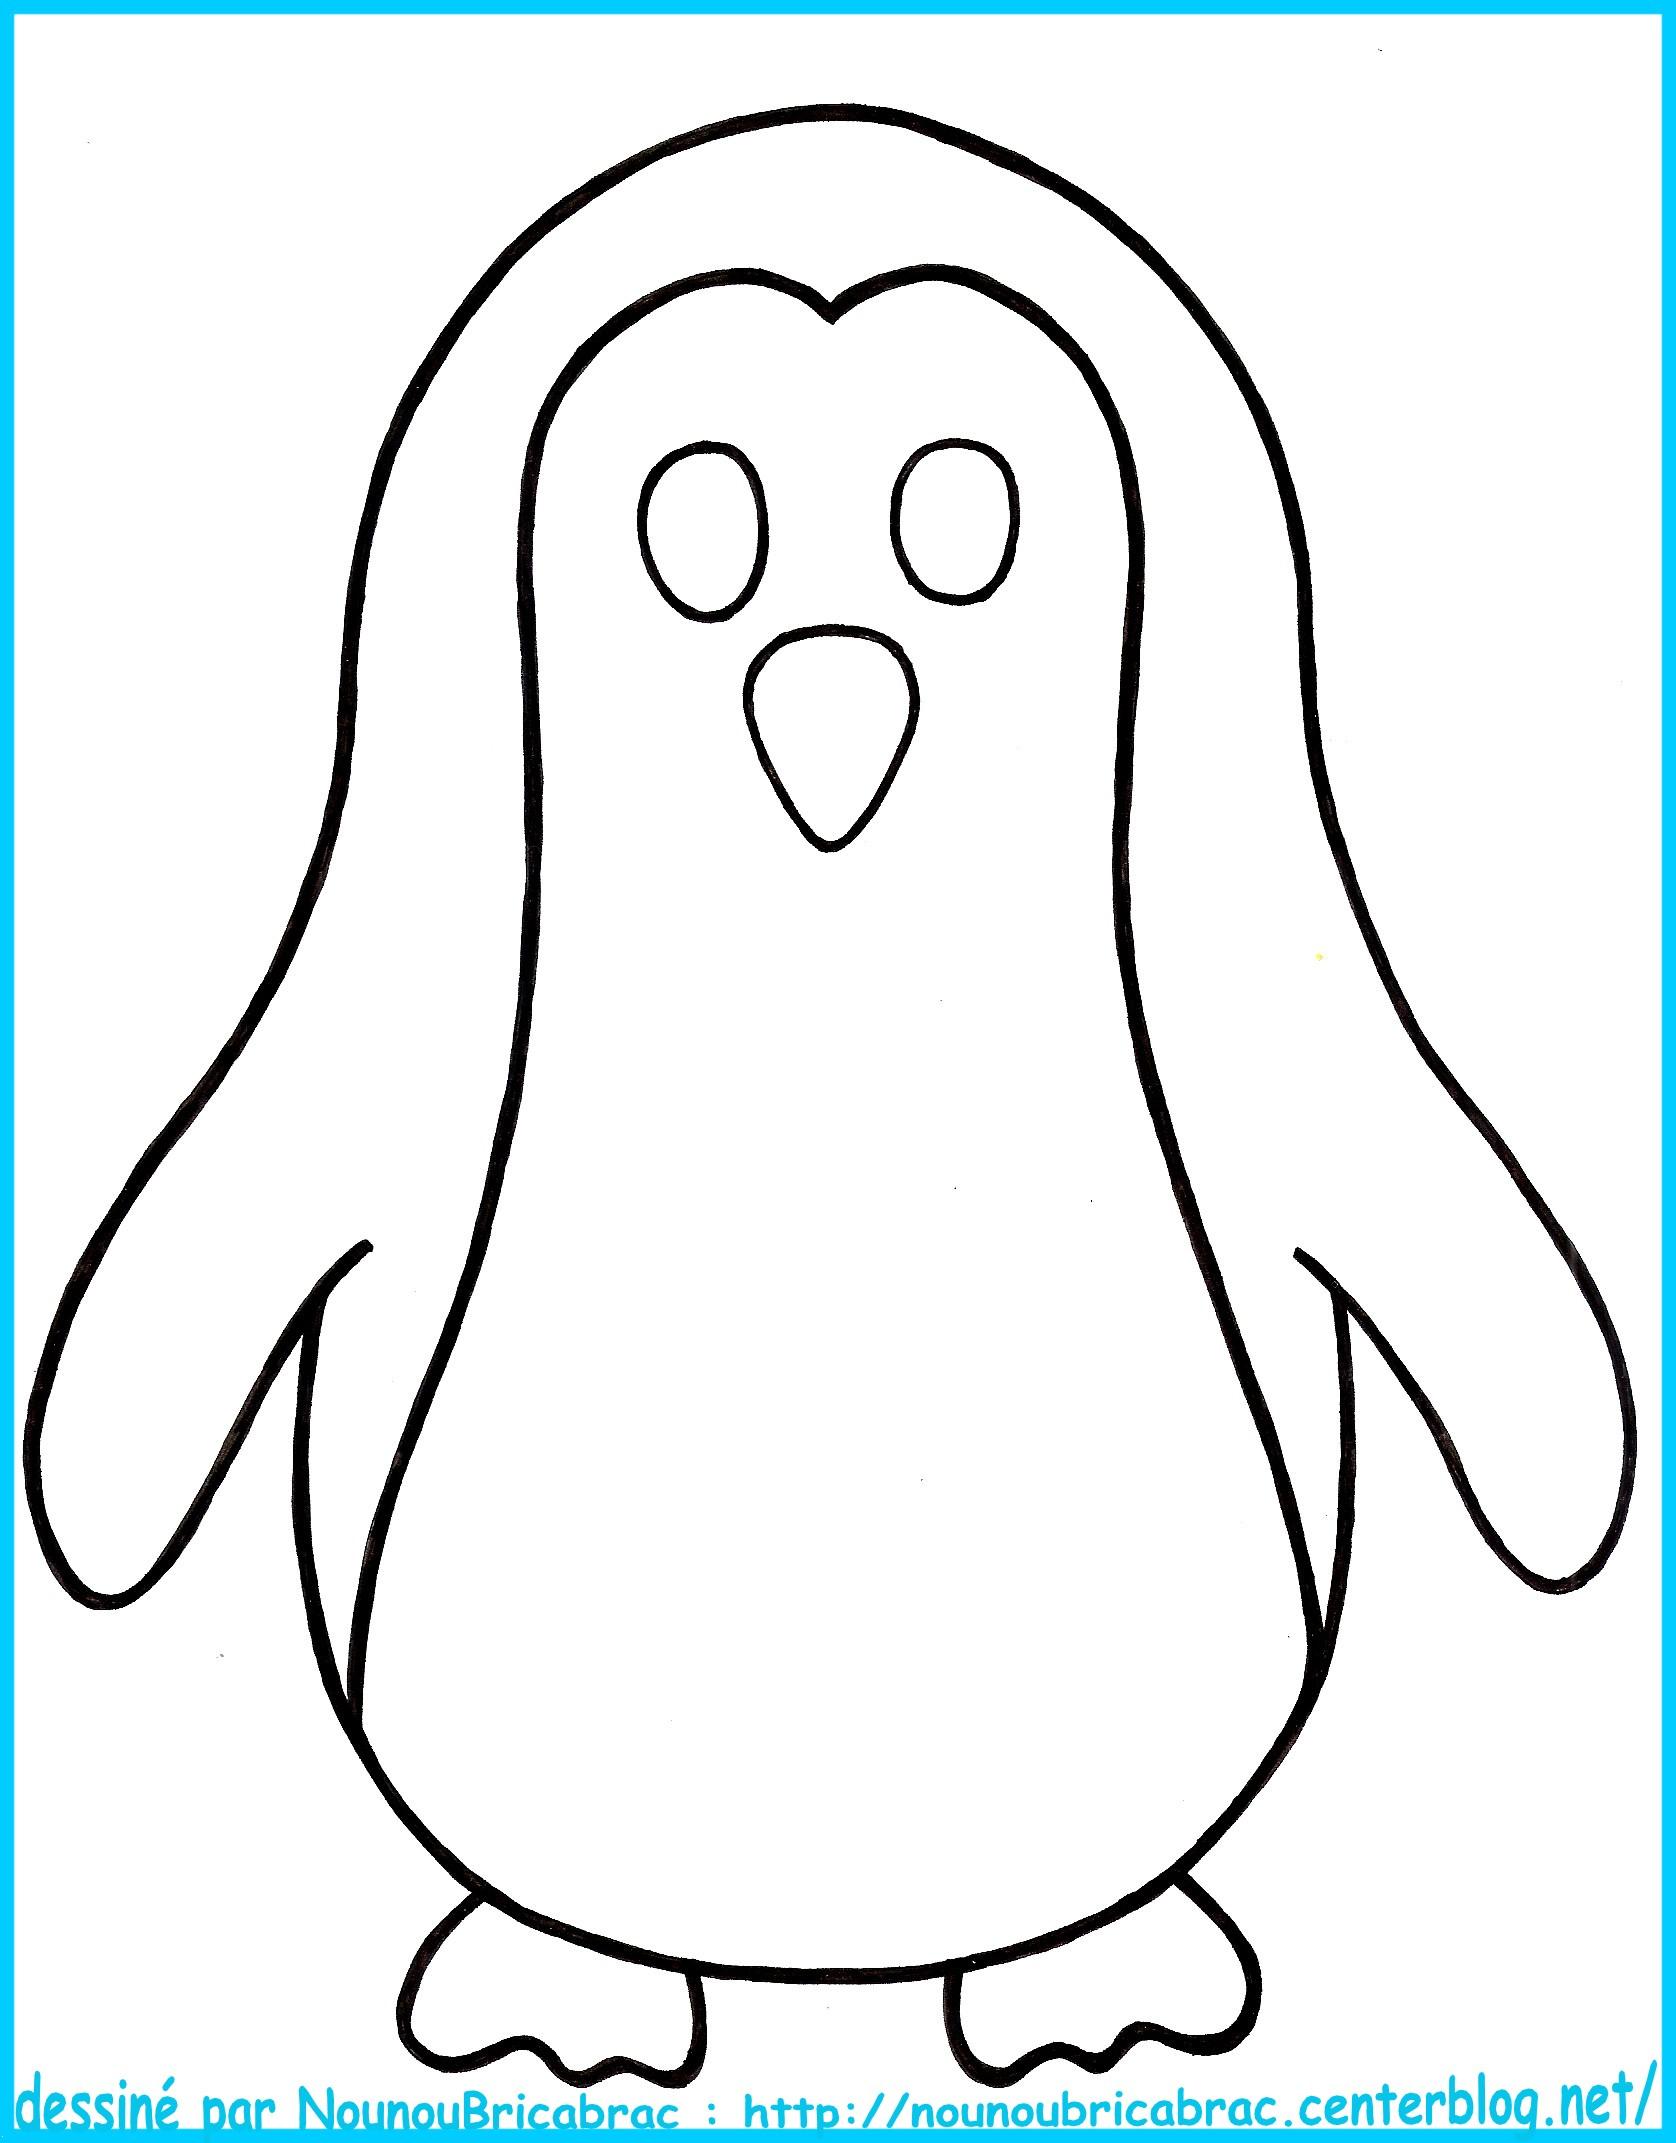 116 dessins de coloriage pingouin imprimer - Modele gratuit pingouin ...